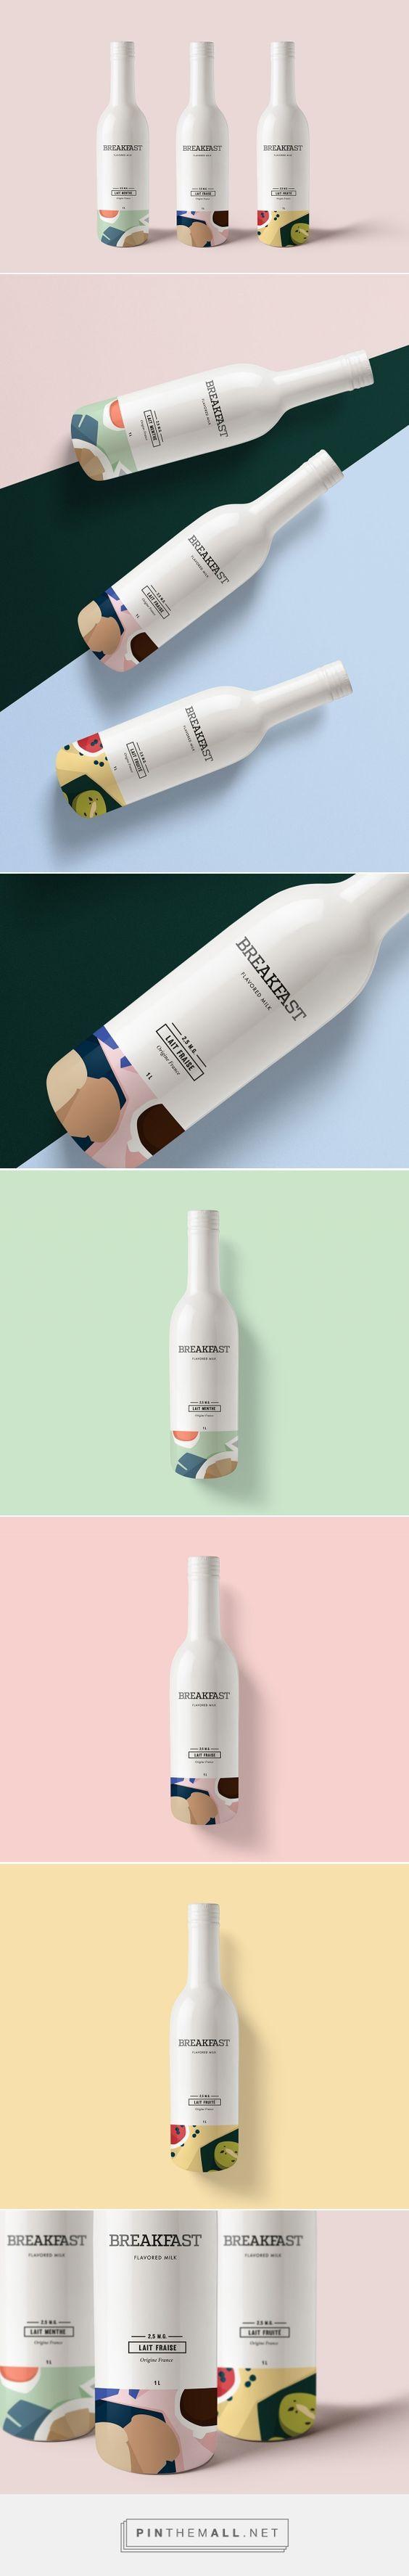 BREAKFAST - Flavored Milk Packaging by Kali Day